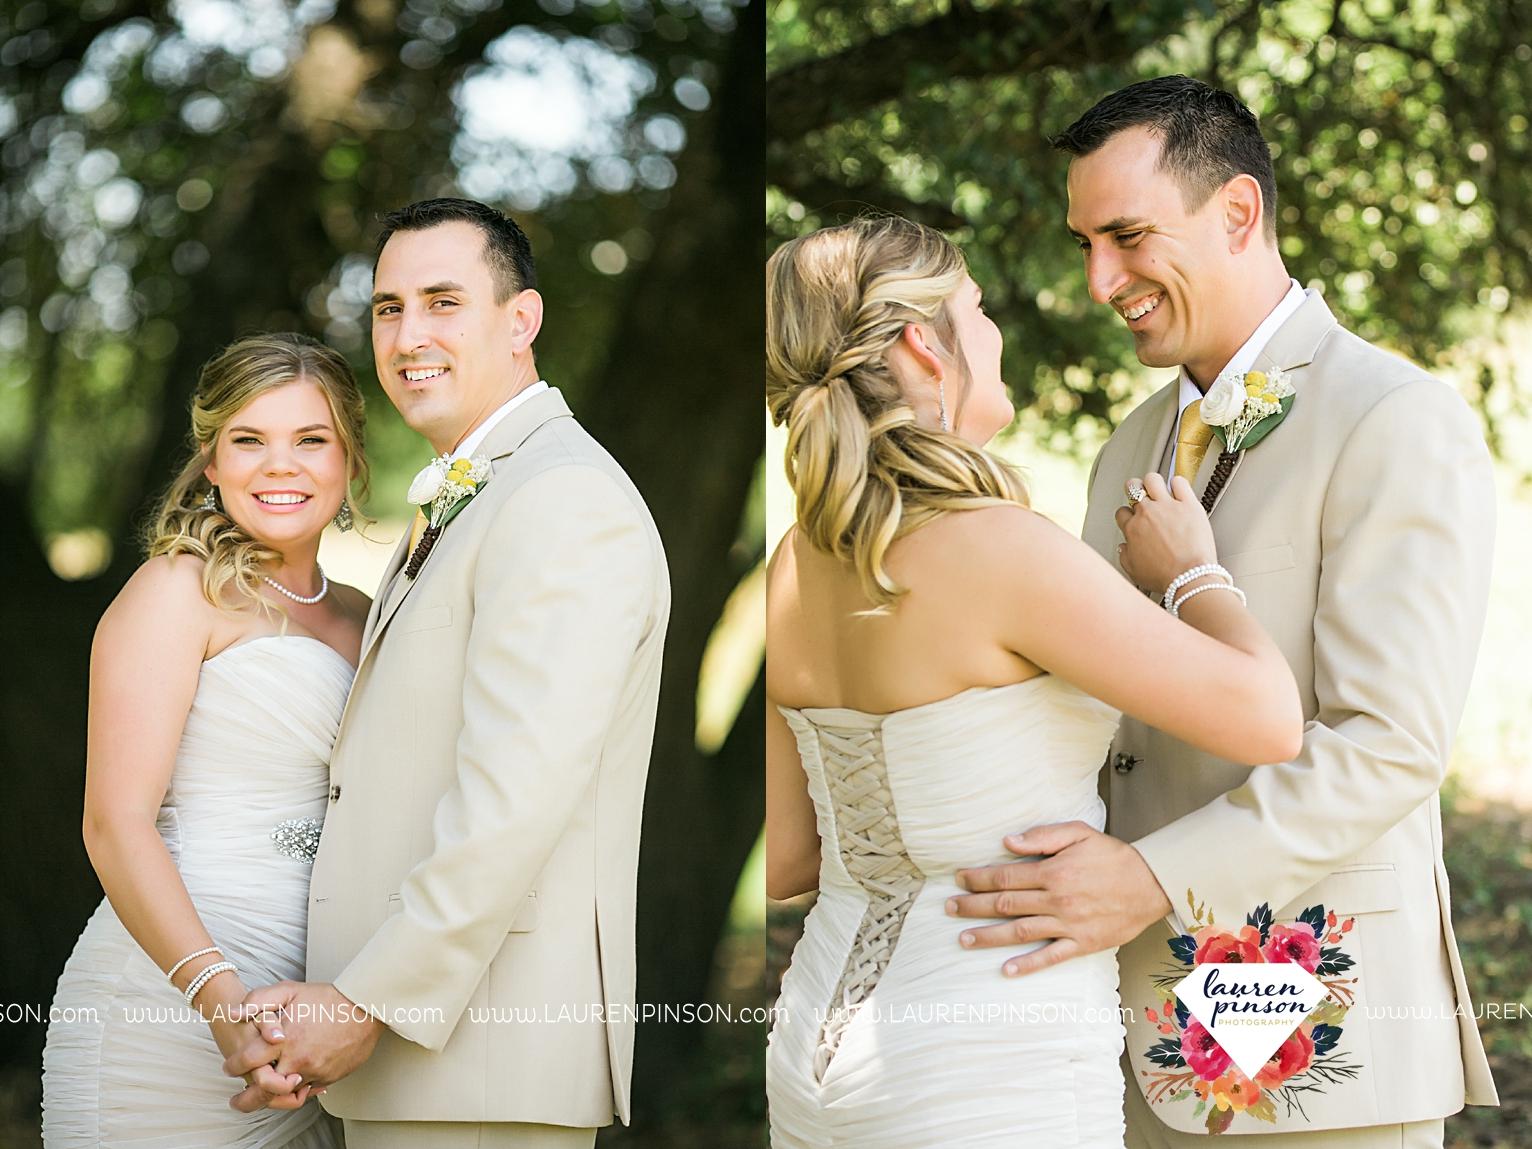 weatherford-texas-hollow-hill-farm-event-wedding-mineral-wells-dfw-wedding-photographer-wichita-falls-photography_3136.jpg